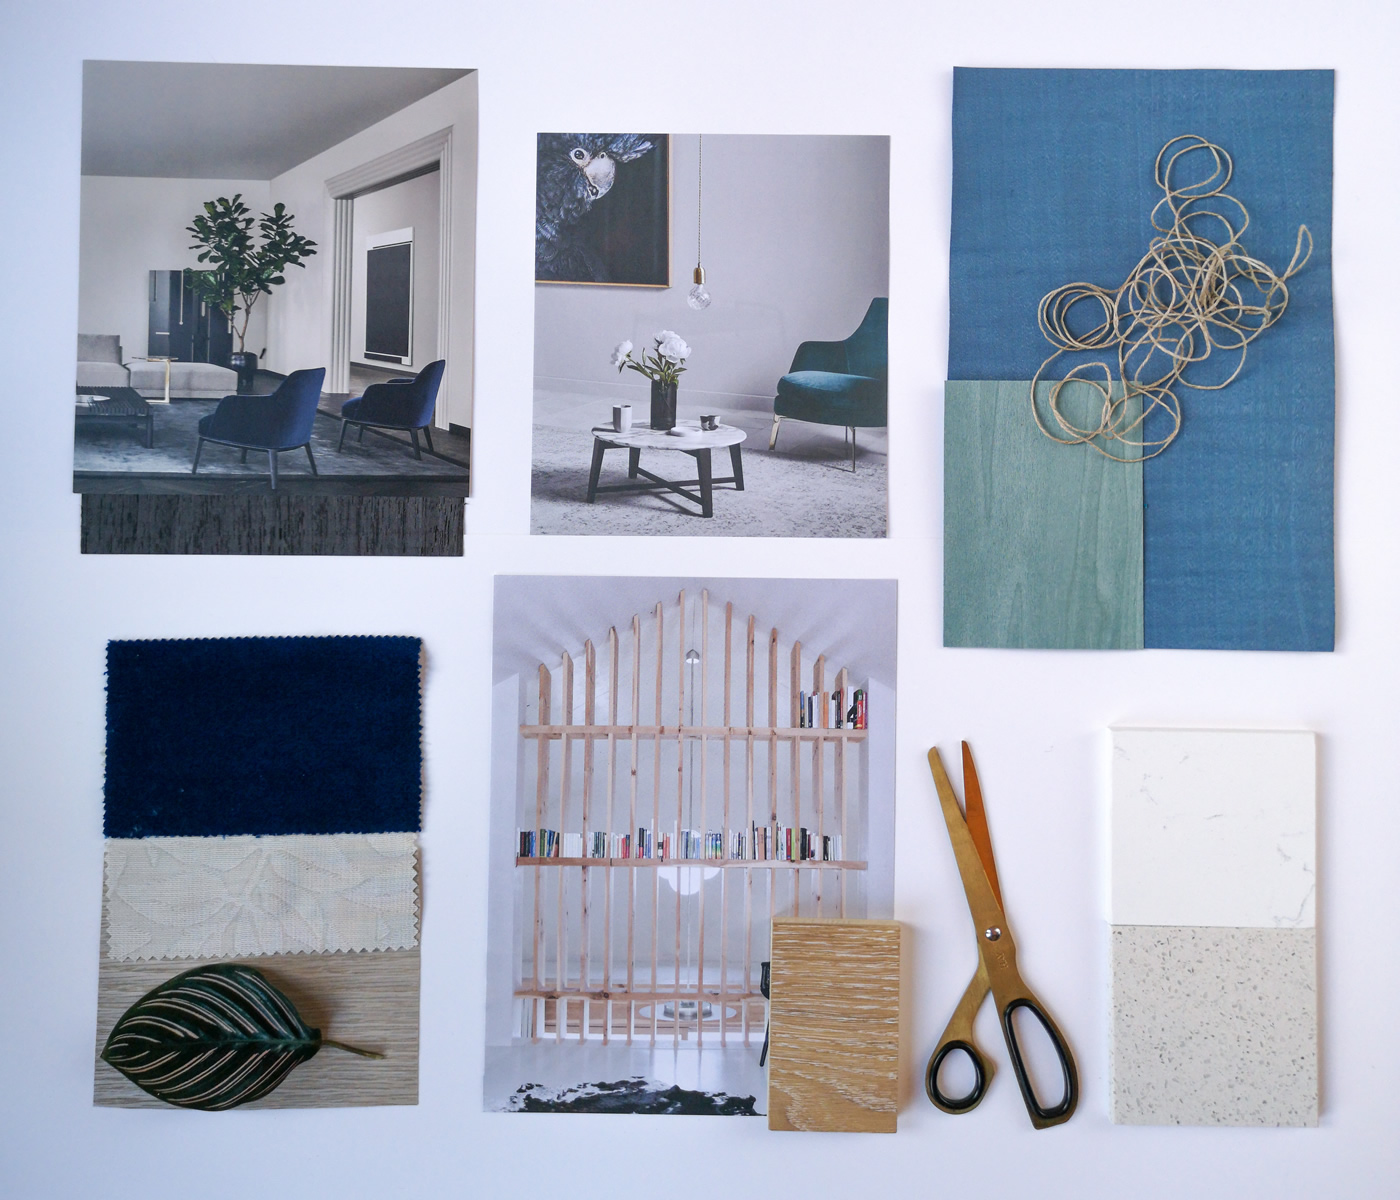 Mood Board Interior Design Workshop at Oatlands Park Hotel in Weybridge Surrey